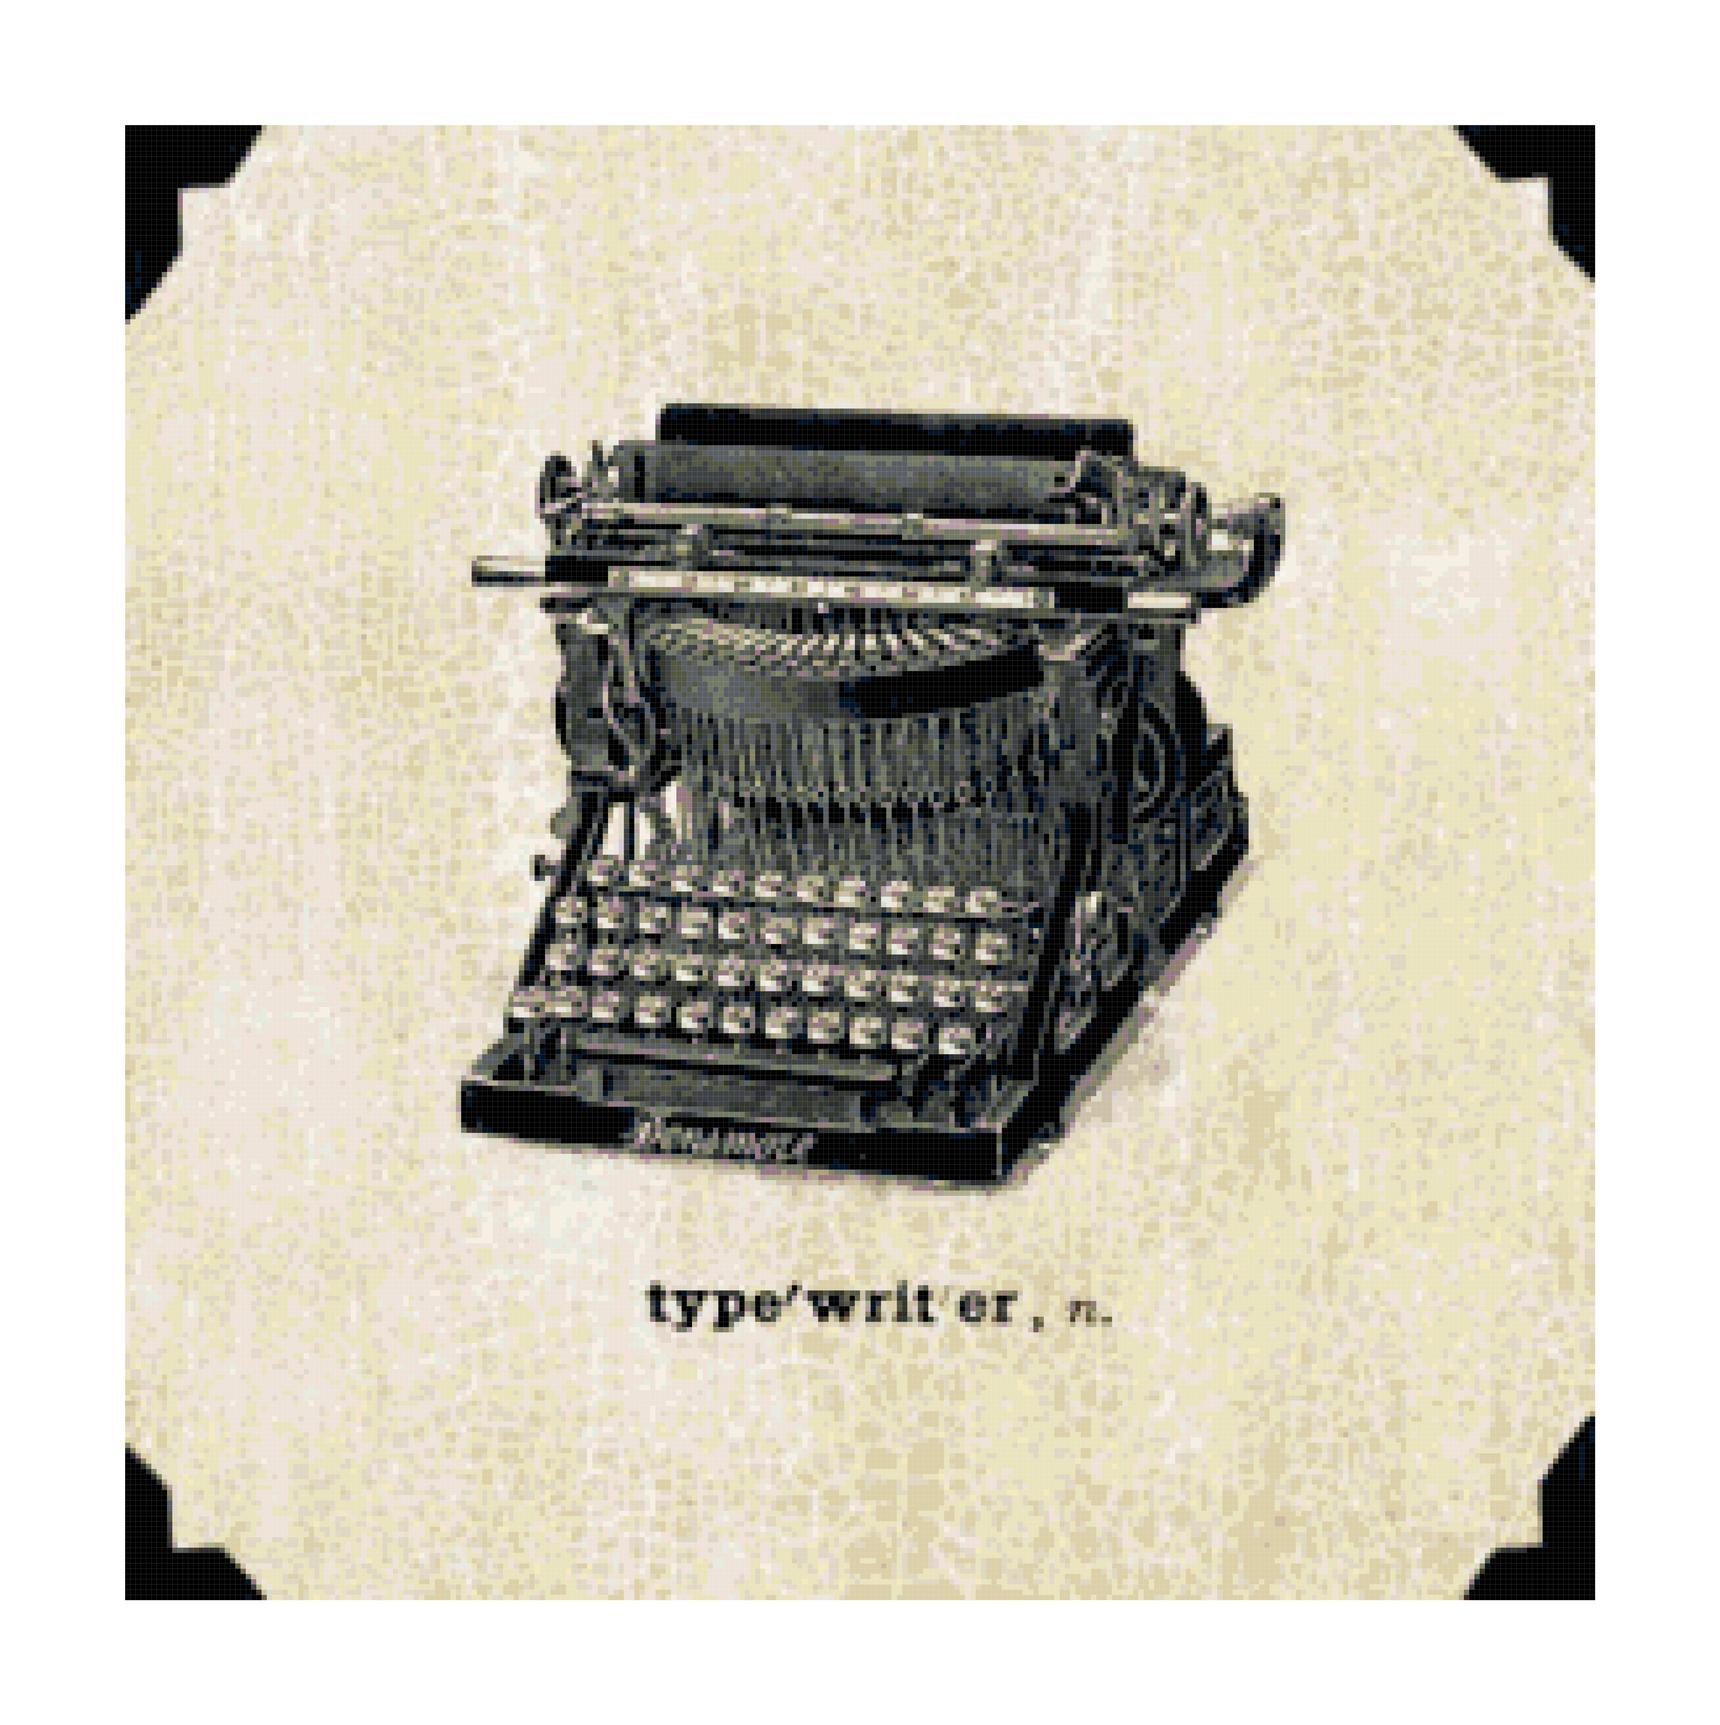 Typewriter cross stitch pattern